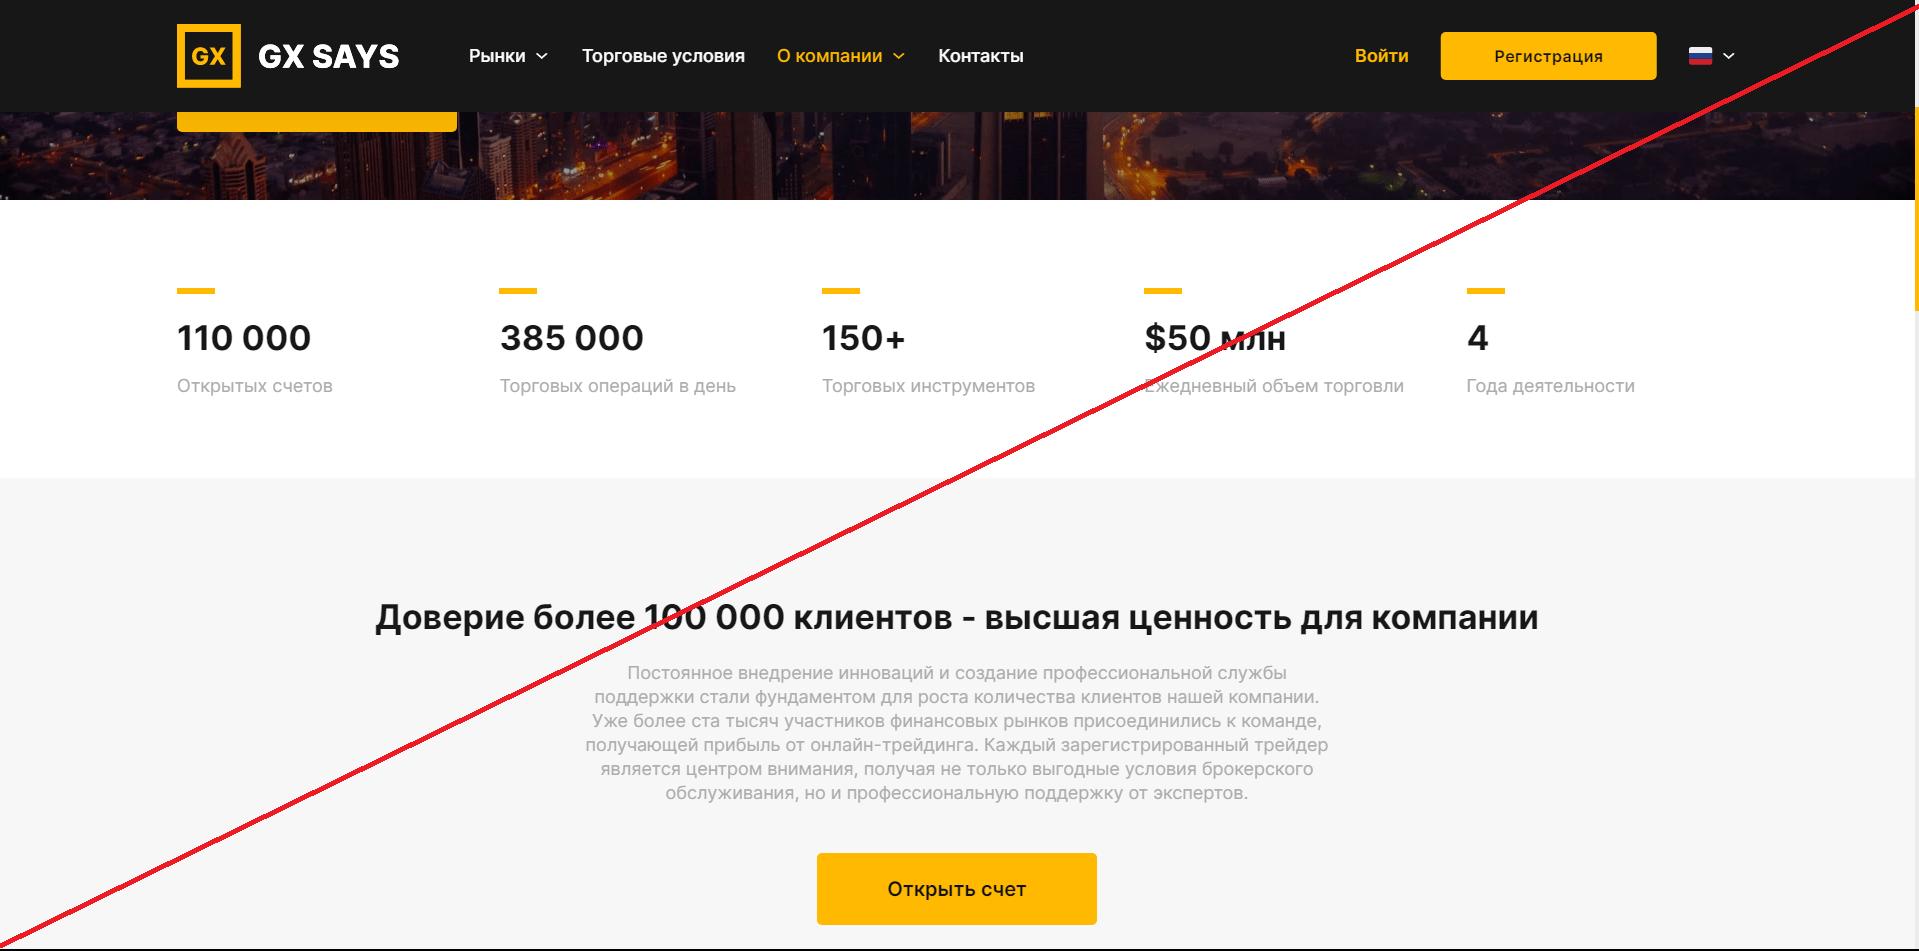 GX Says - Мошенники